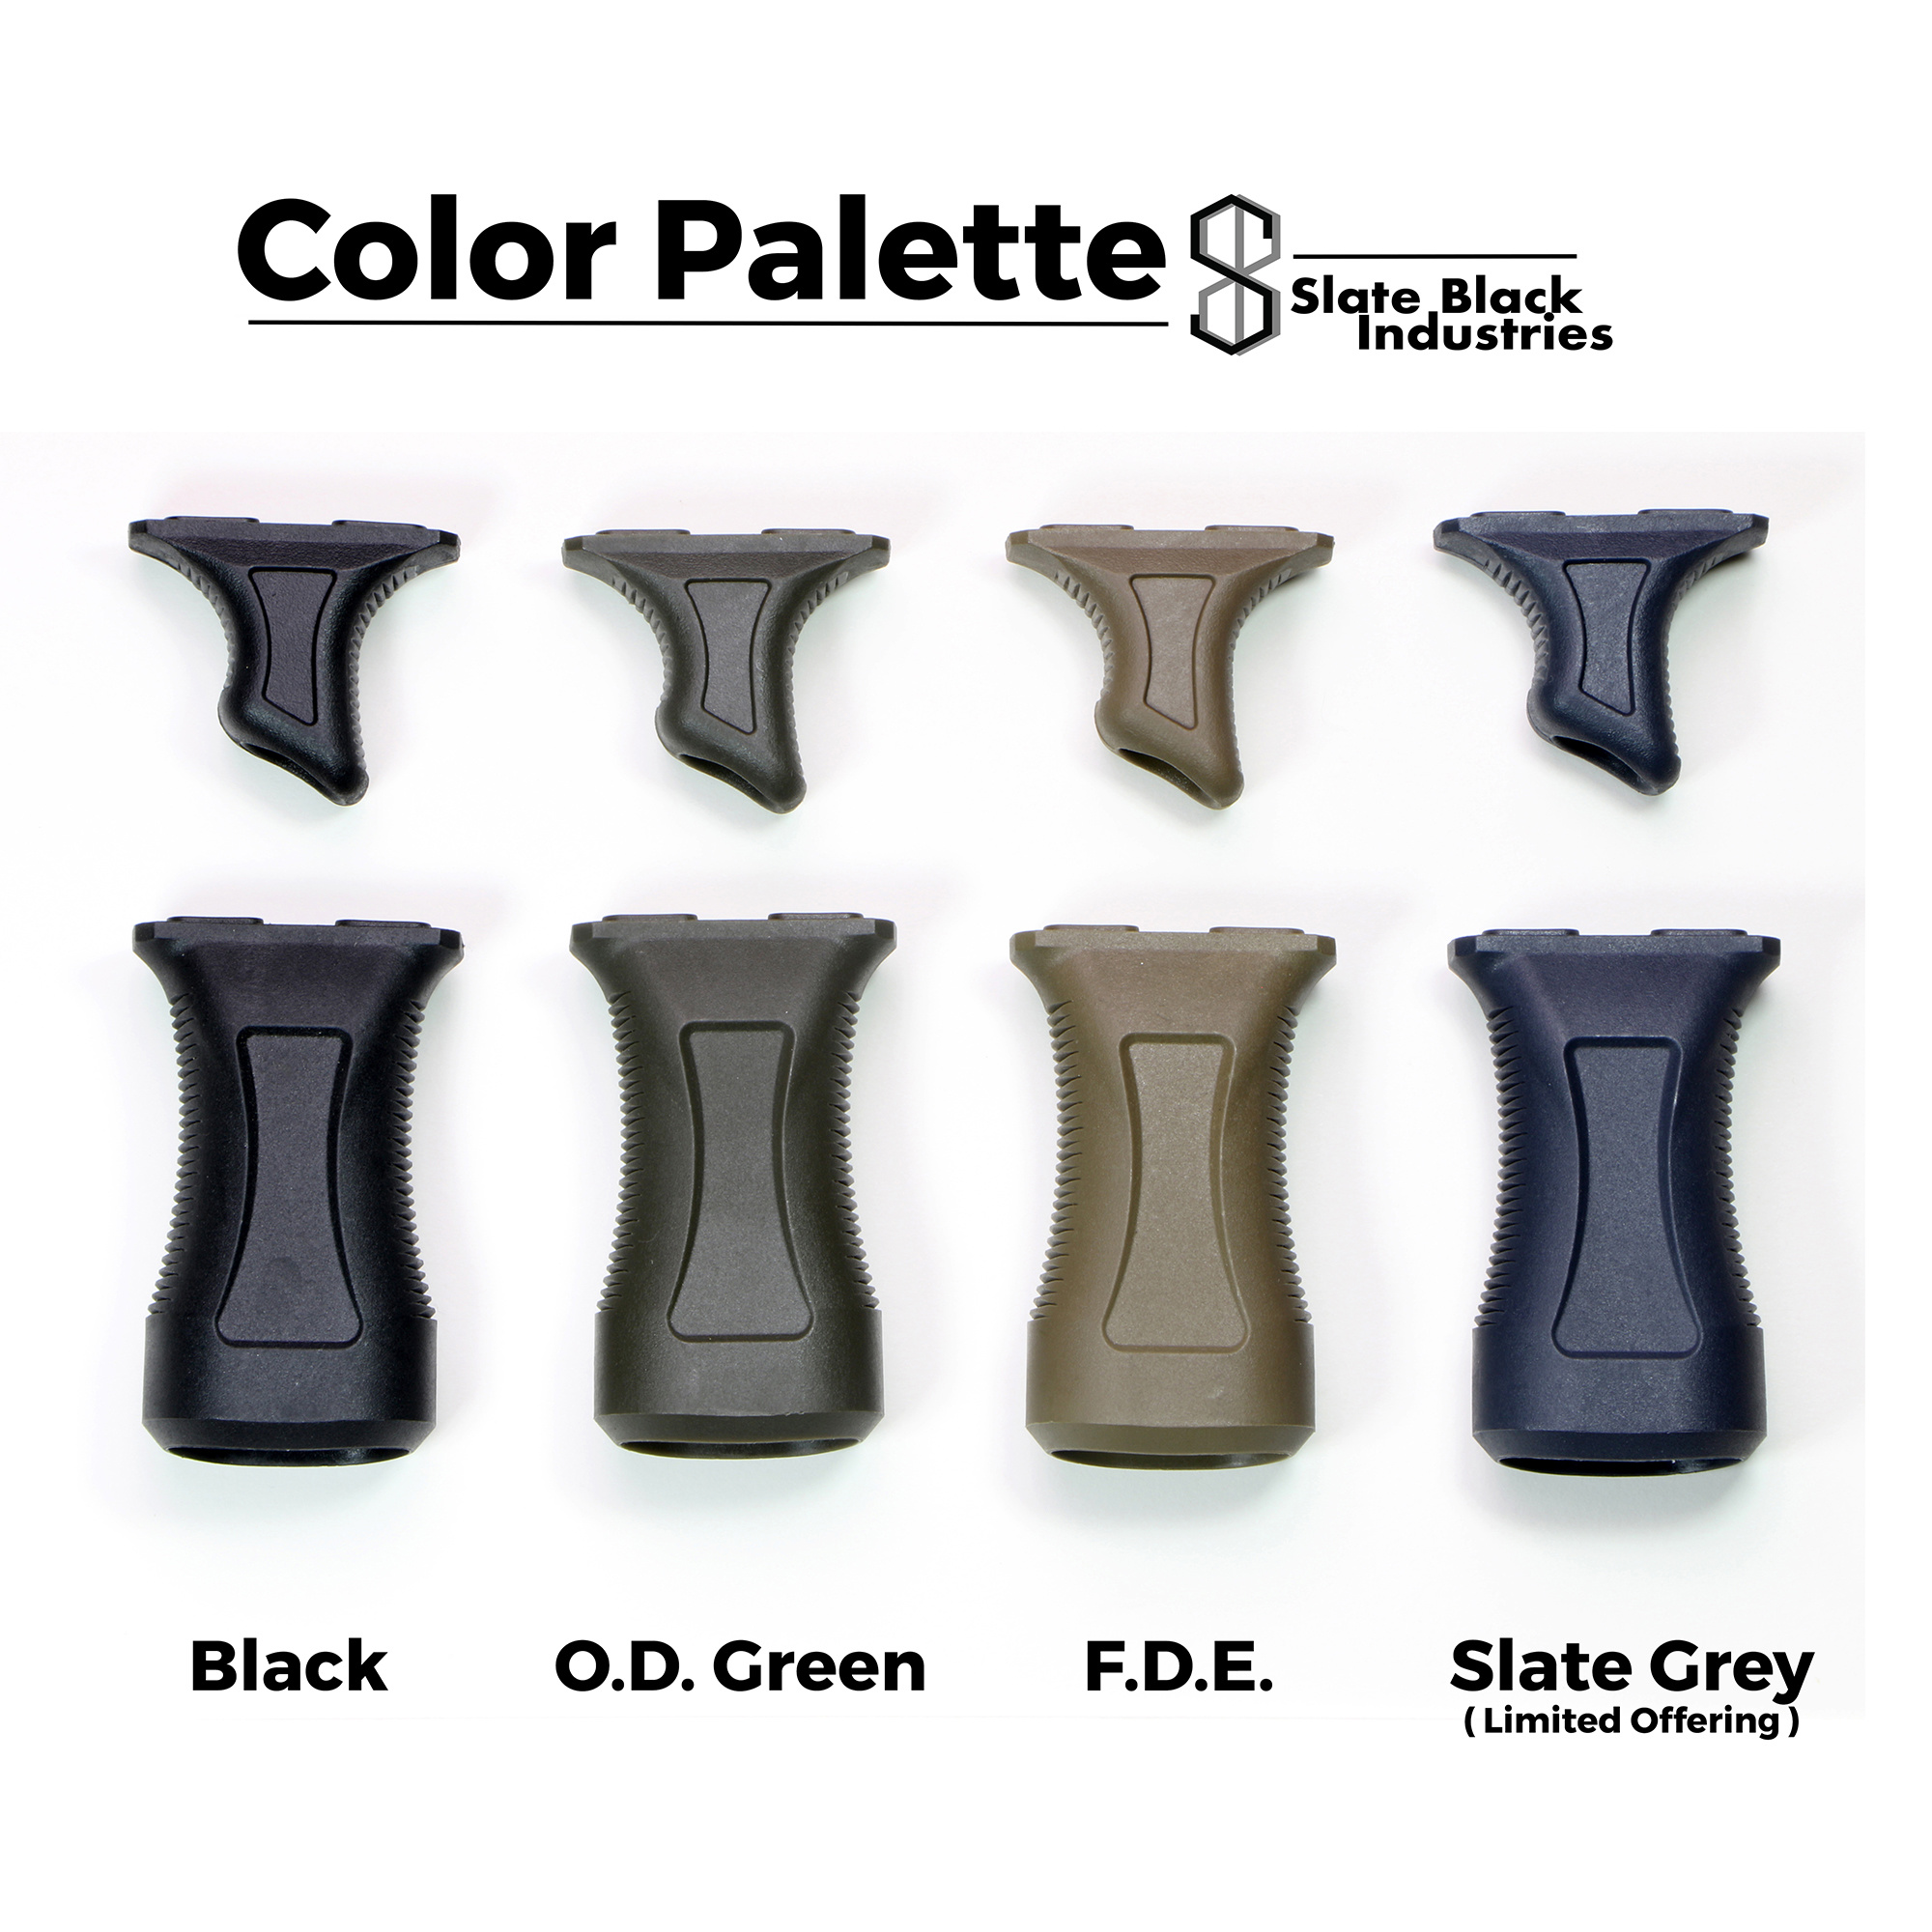 Slate Black Industries SVG, M-LOK